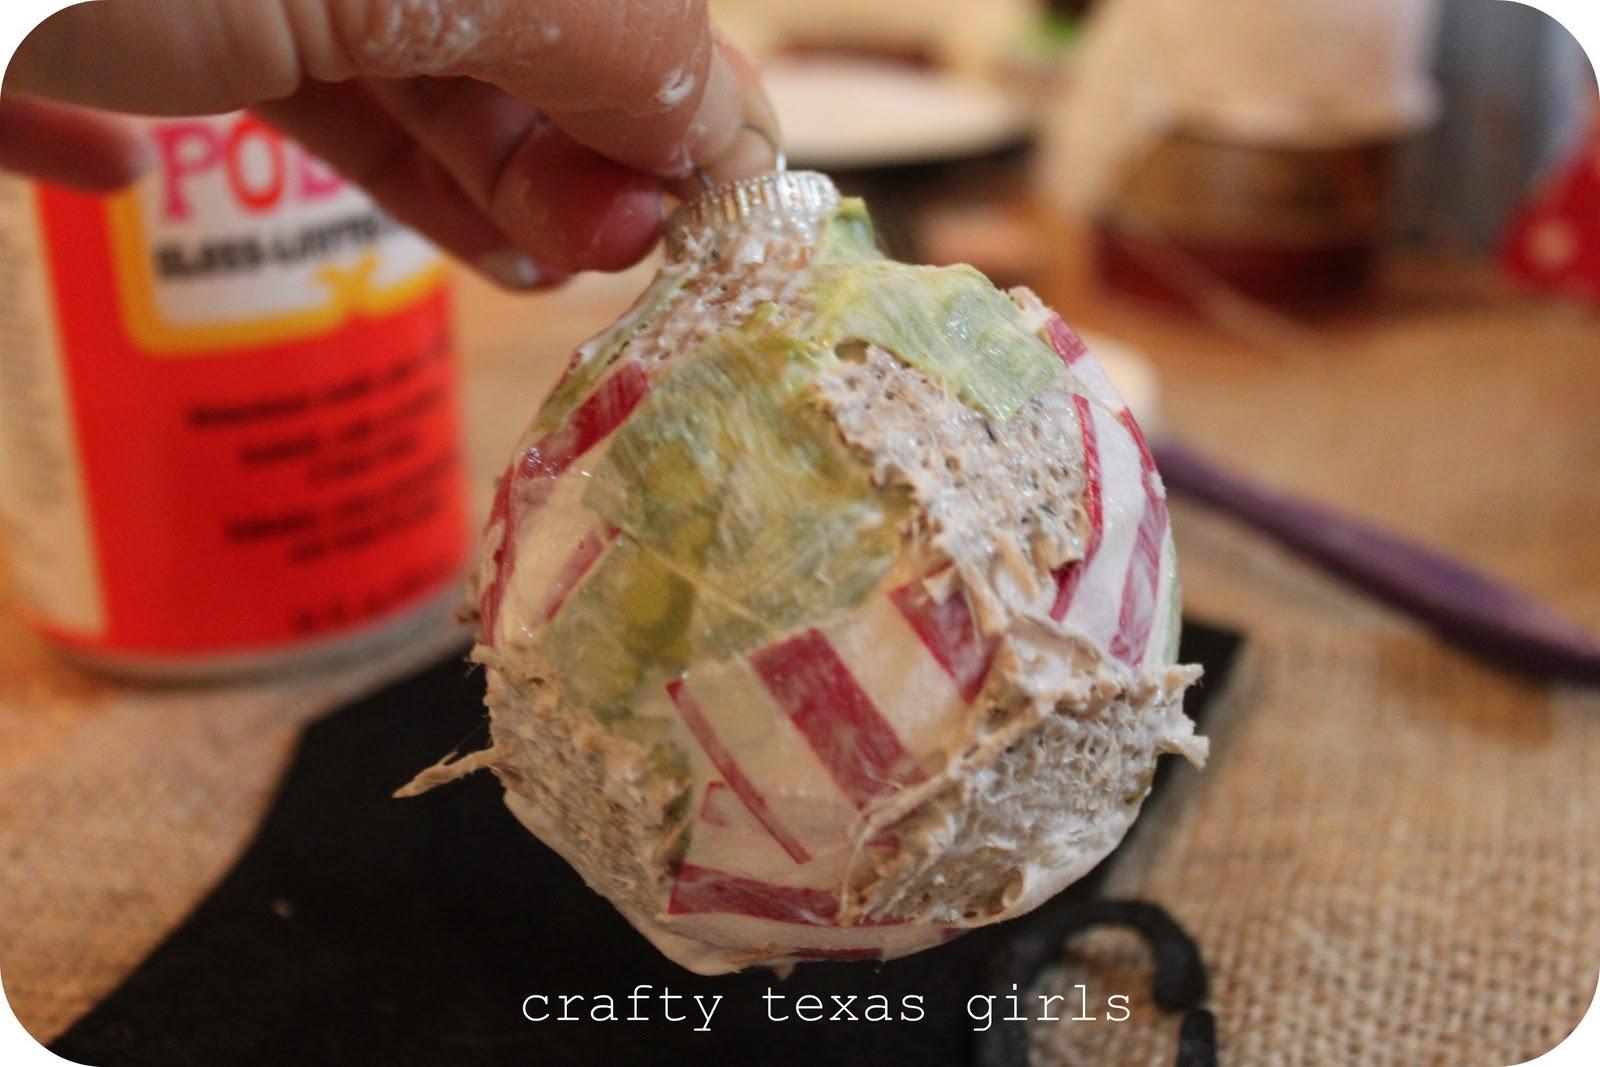 Crafty Texas Girls: Crafty How To: Shabby Chic Mod Podge Ornaments